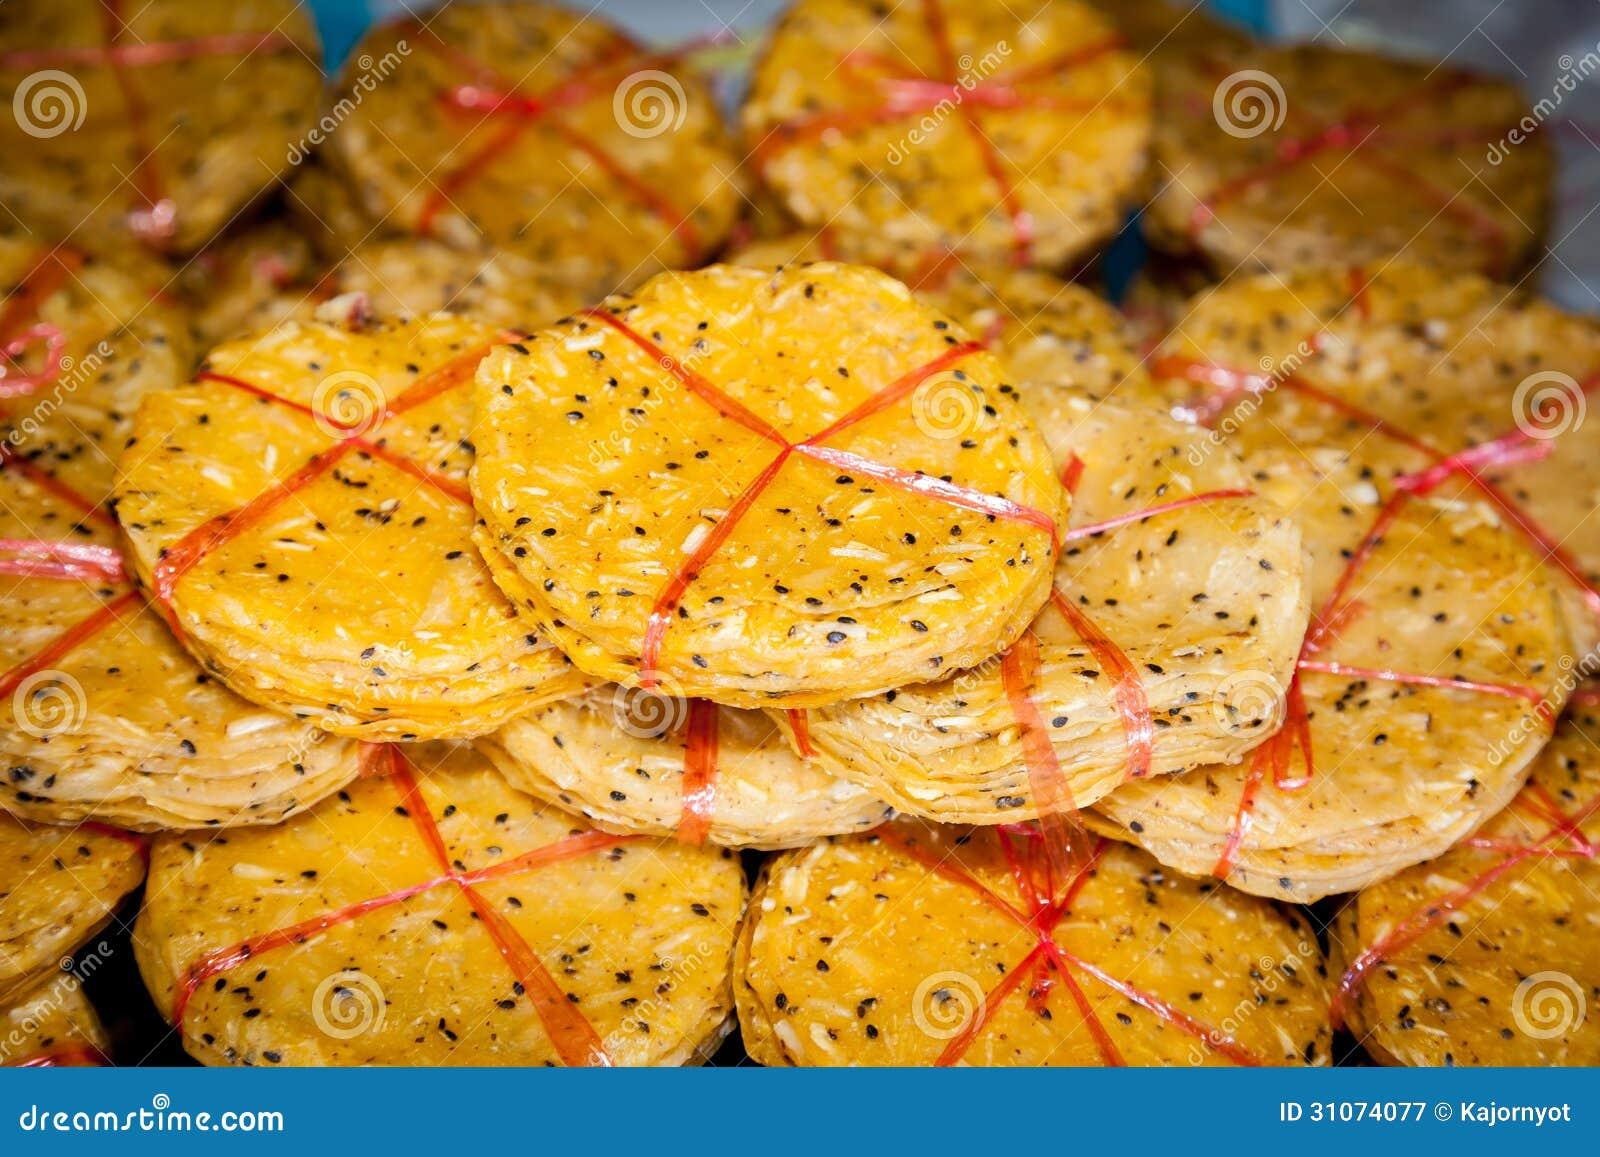 Black sesame crisped crackers